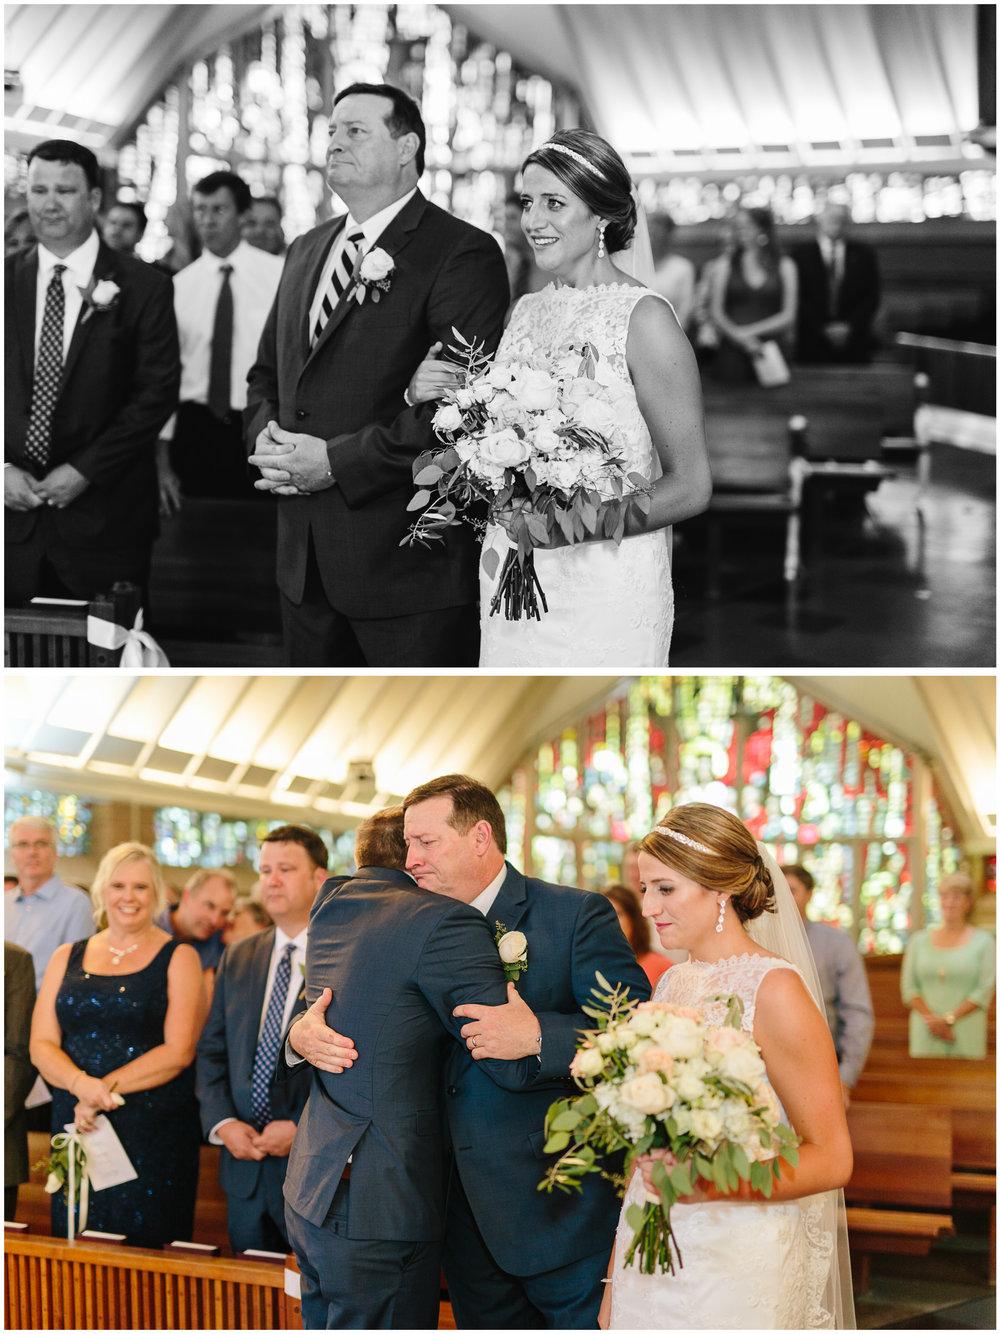 ann_arbor_michigan_wedding_63.jpg